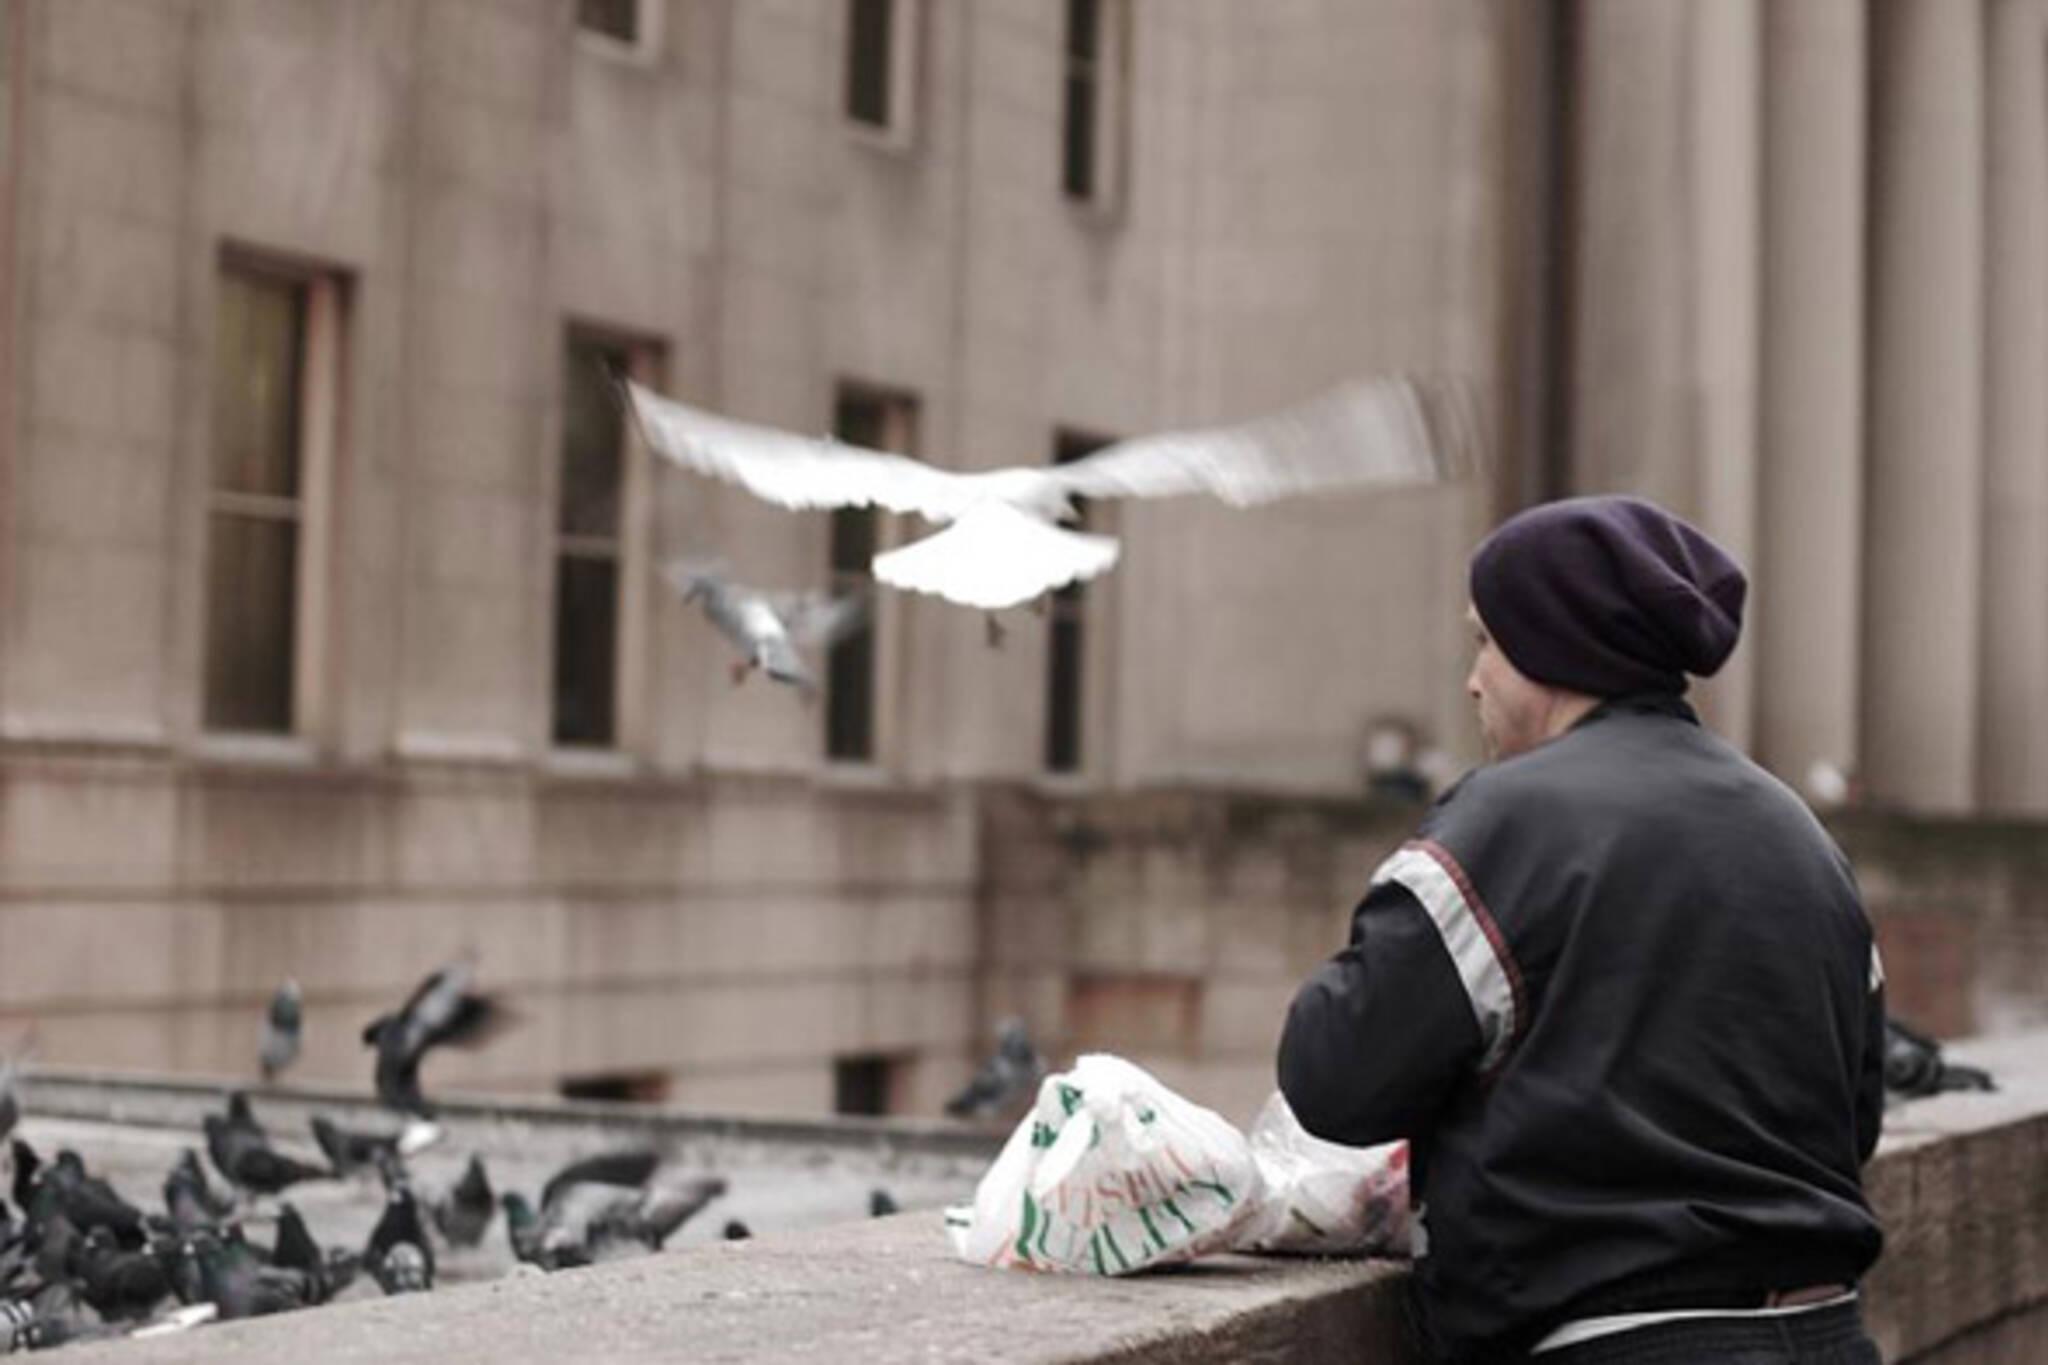 Toronto Union Station bird man